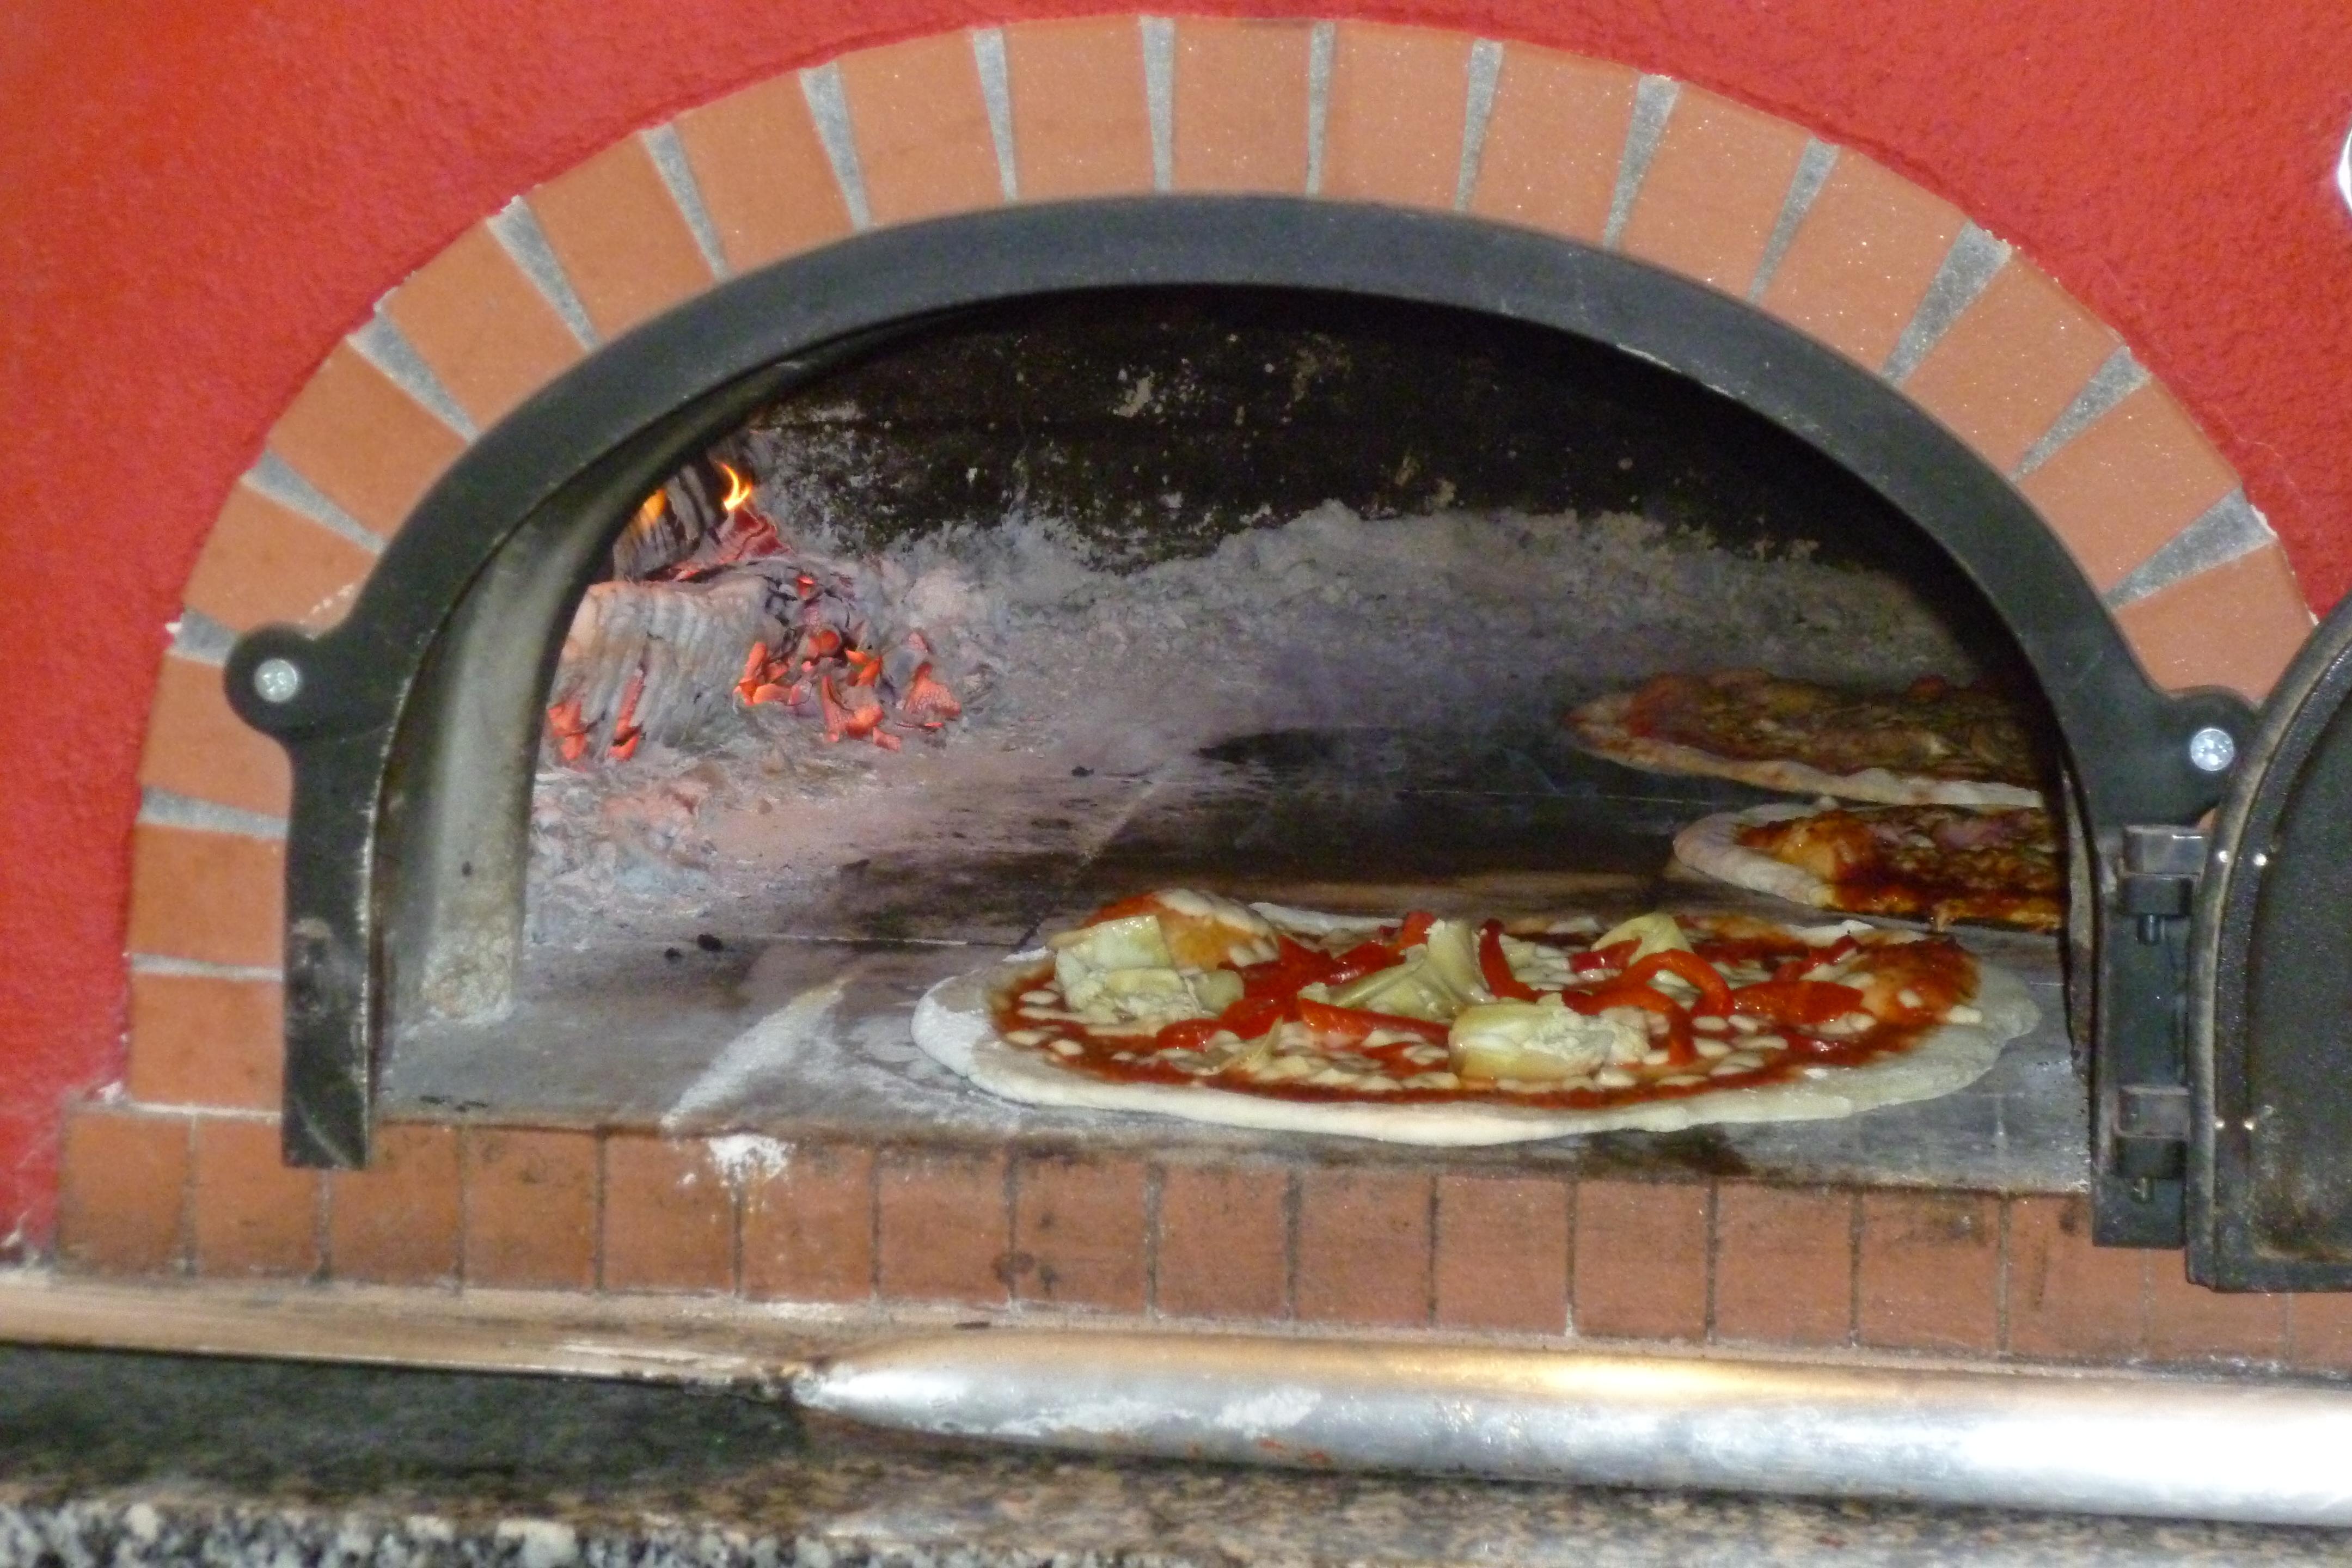 File:2012 07 08 Pizza Oven Club Noi Rotkreuz.JPG